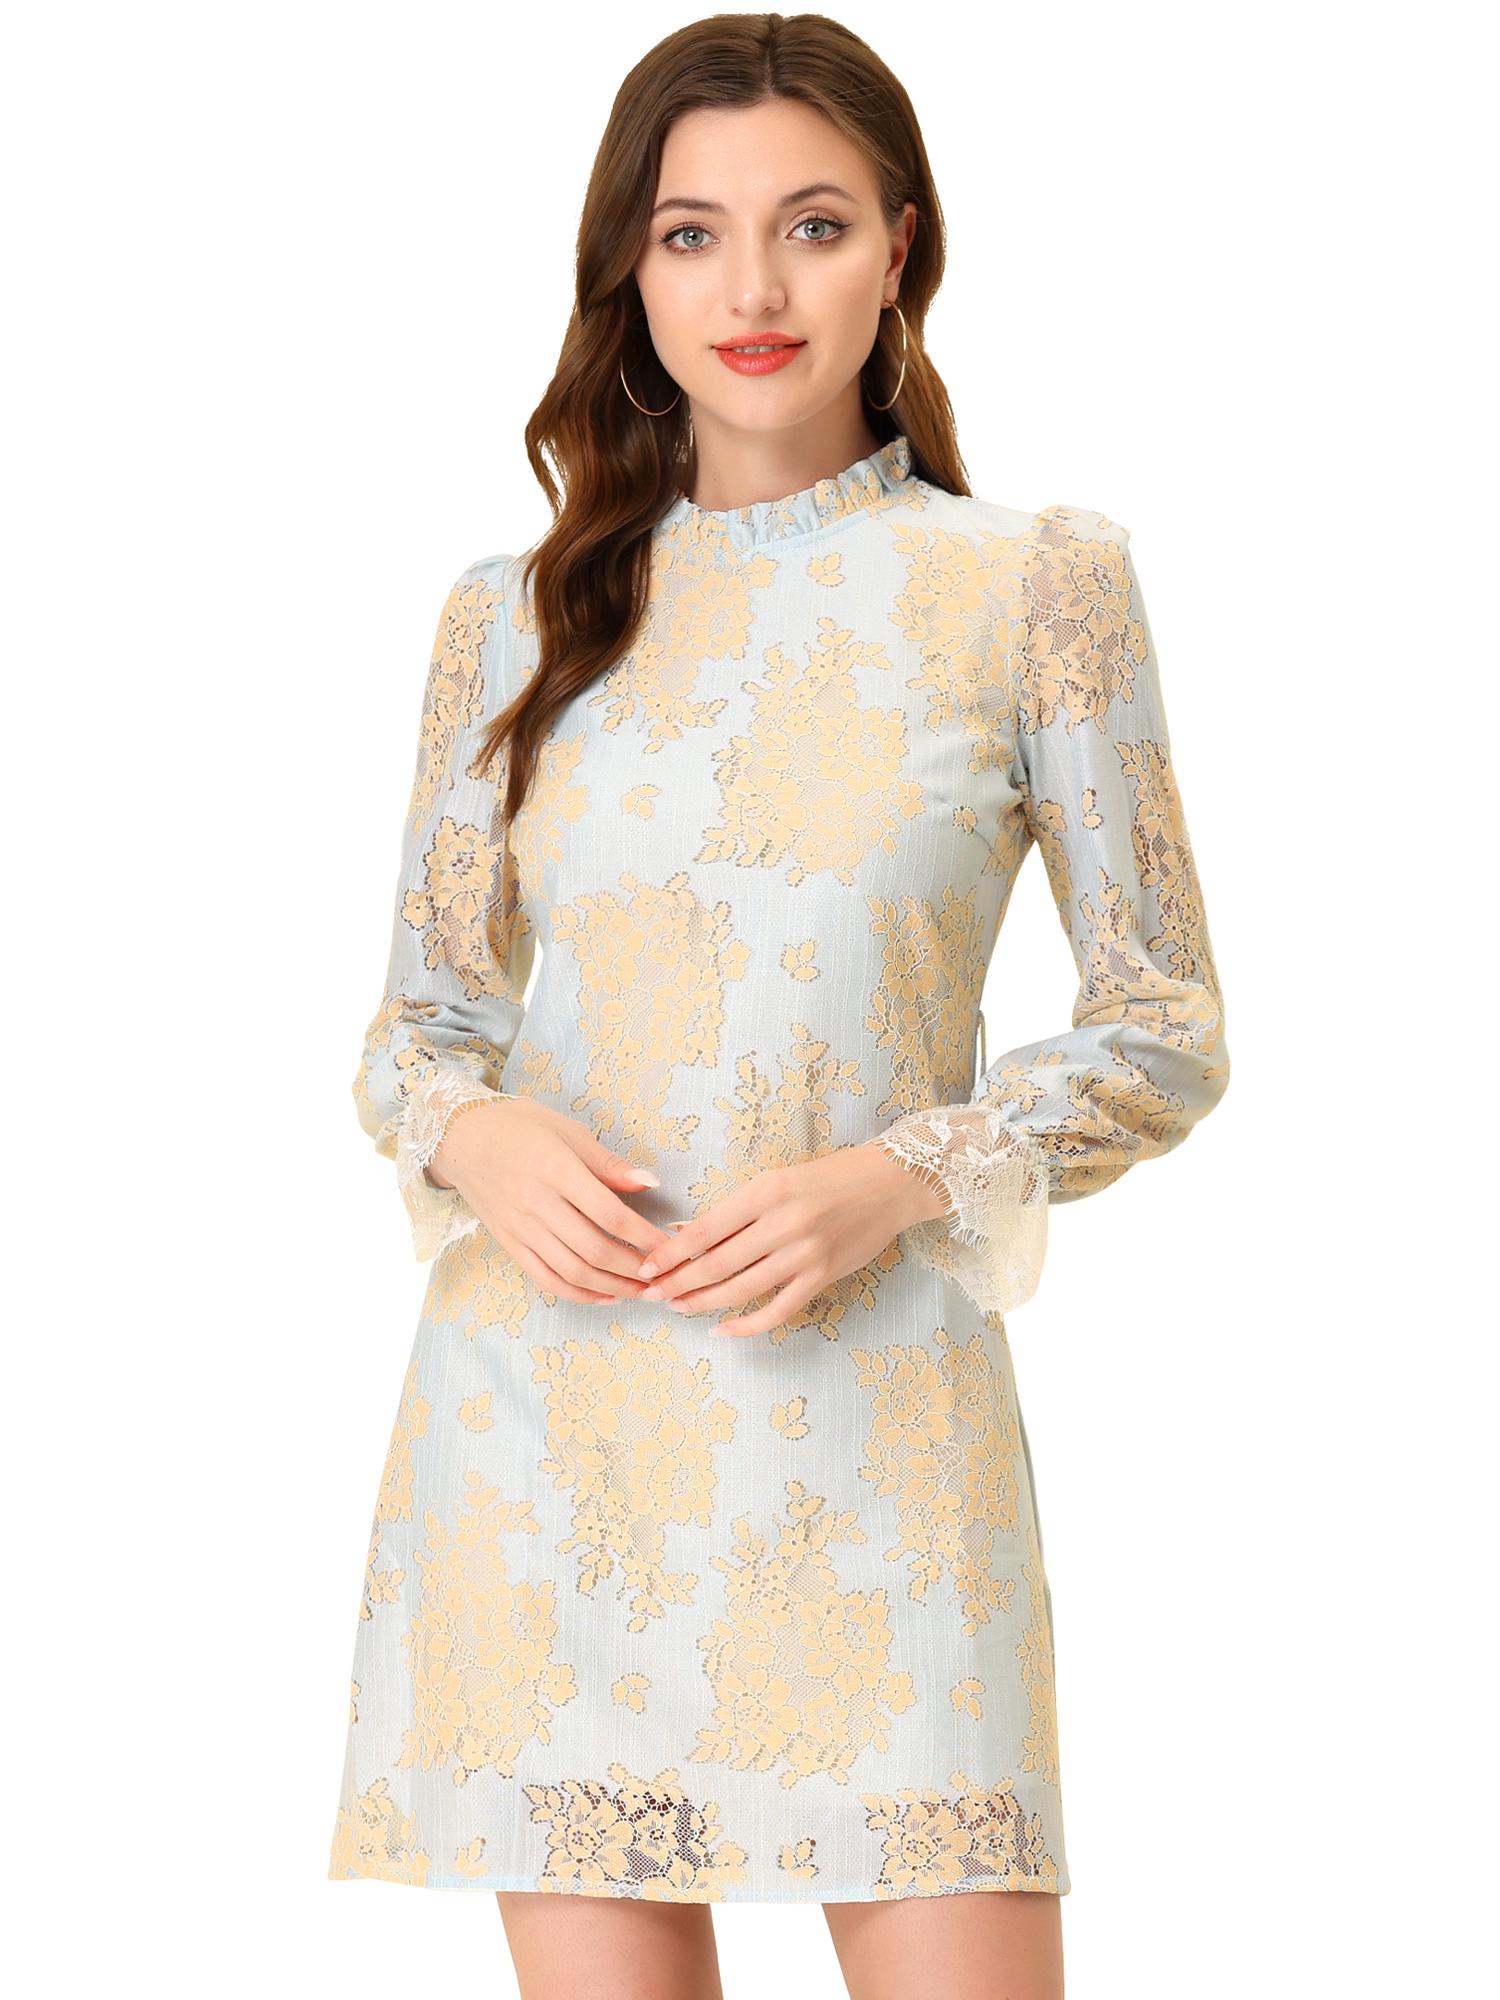 Allegra K Women's Ruffle Crew Neck Mini Floral Lace Dress Light Blue S